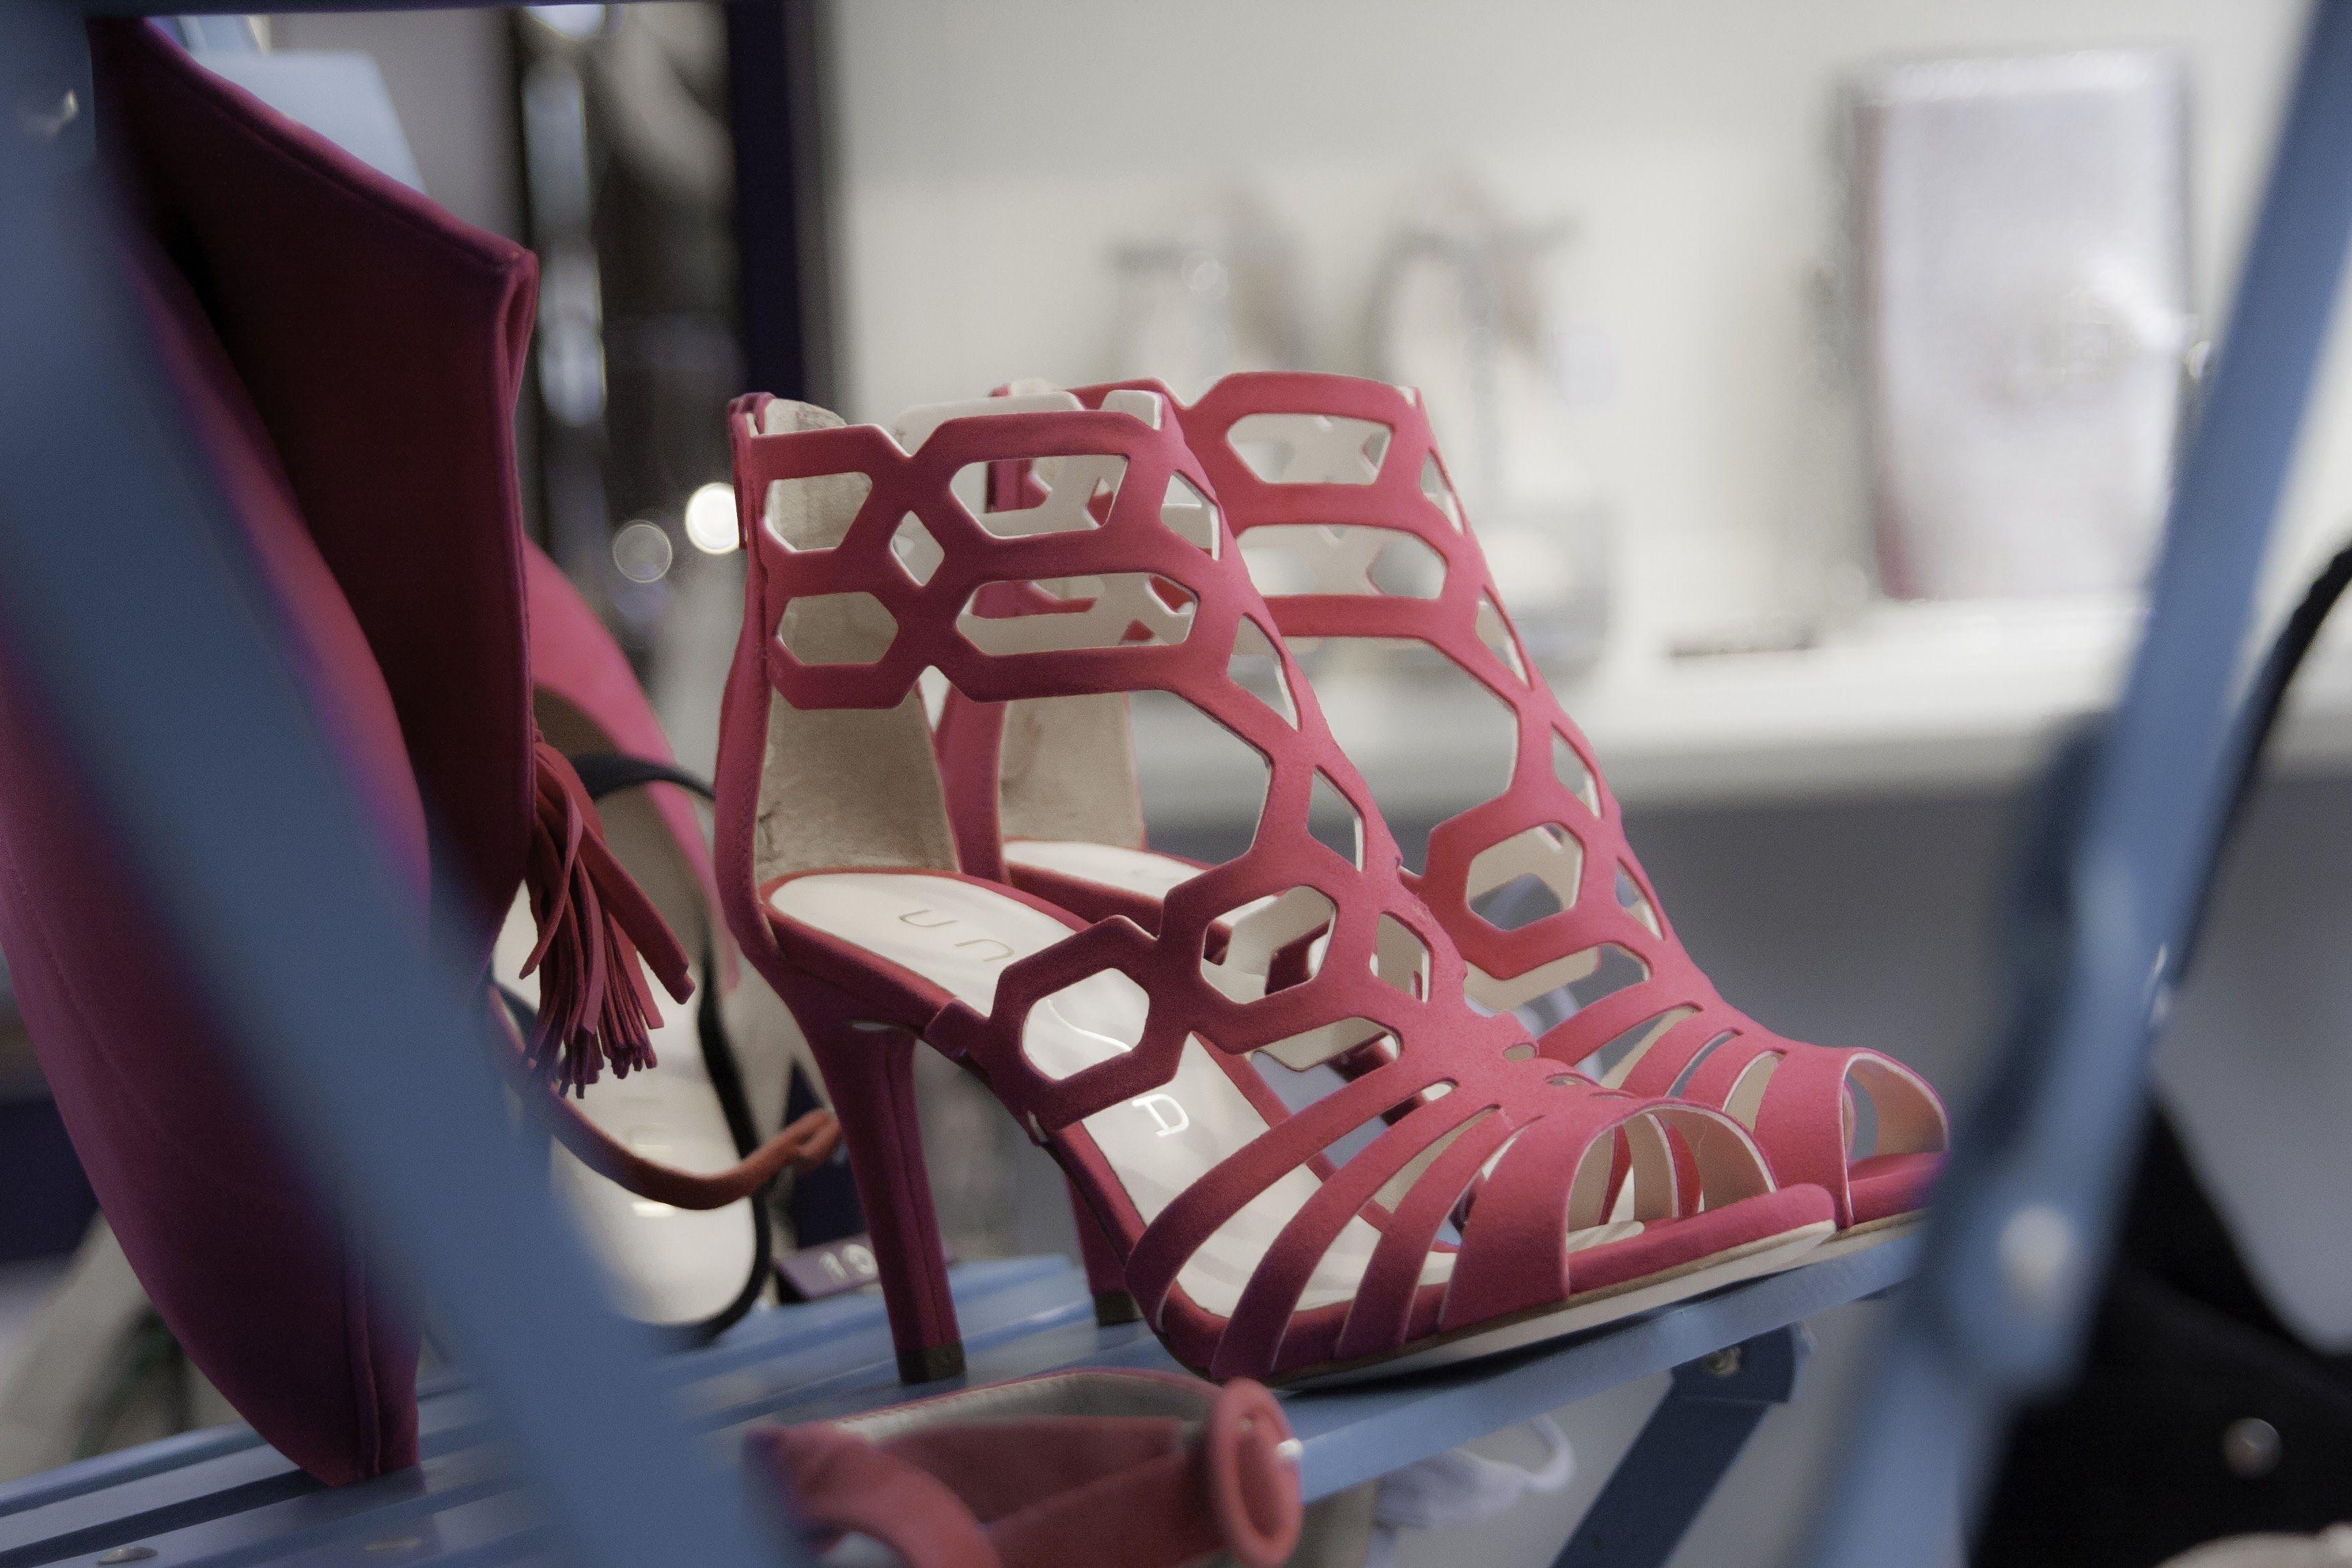 Foto 9 de Calzado para mujer en  | Calzados Prietos